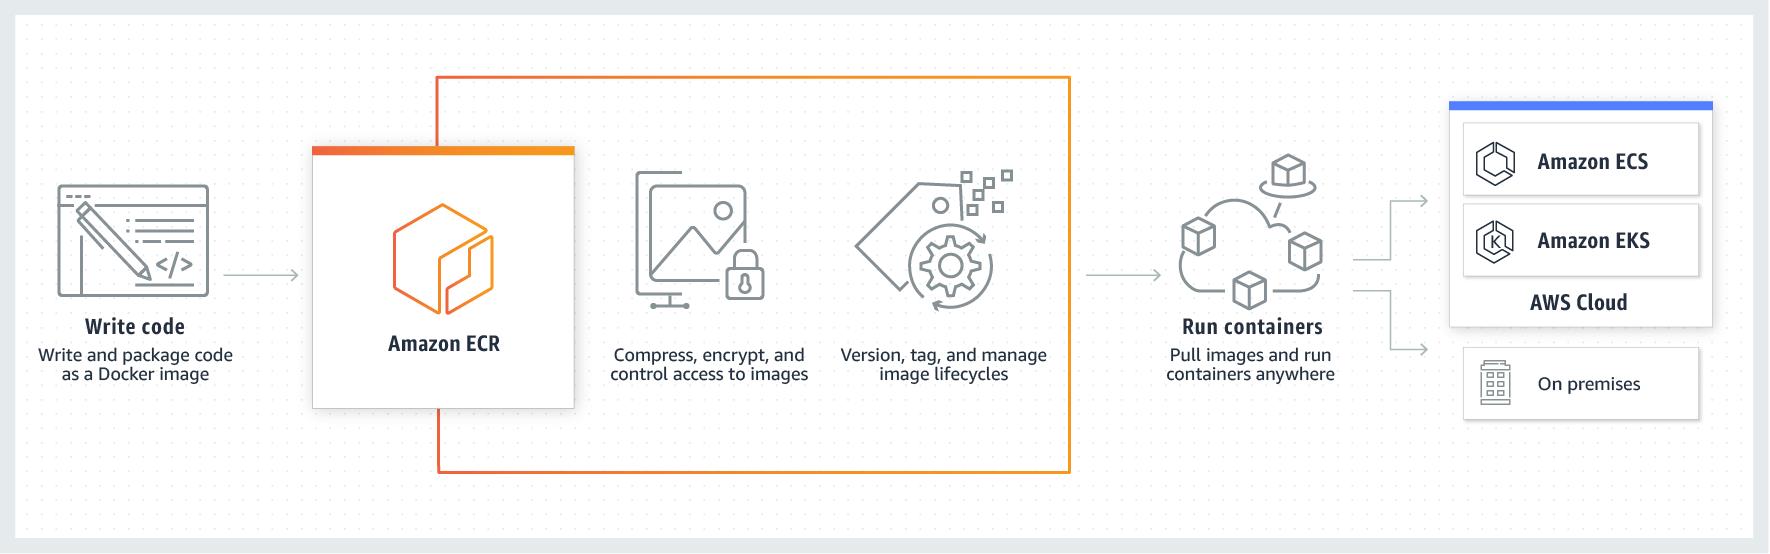 Product-Page-Diagram_Amazon-ECR